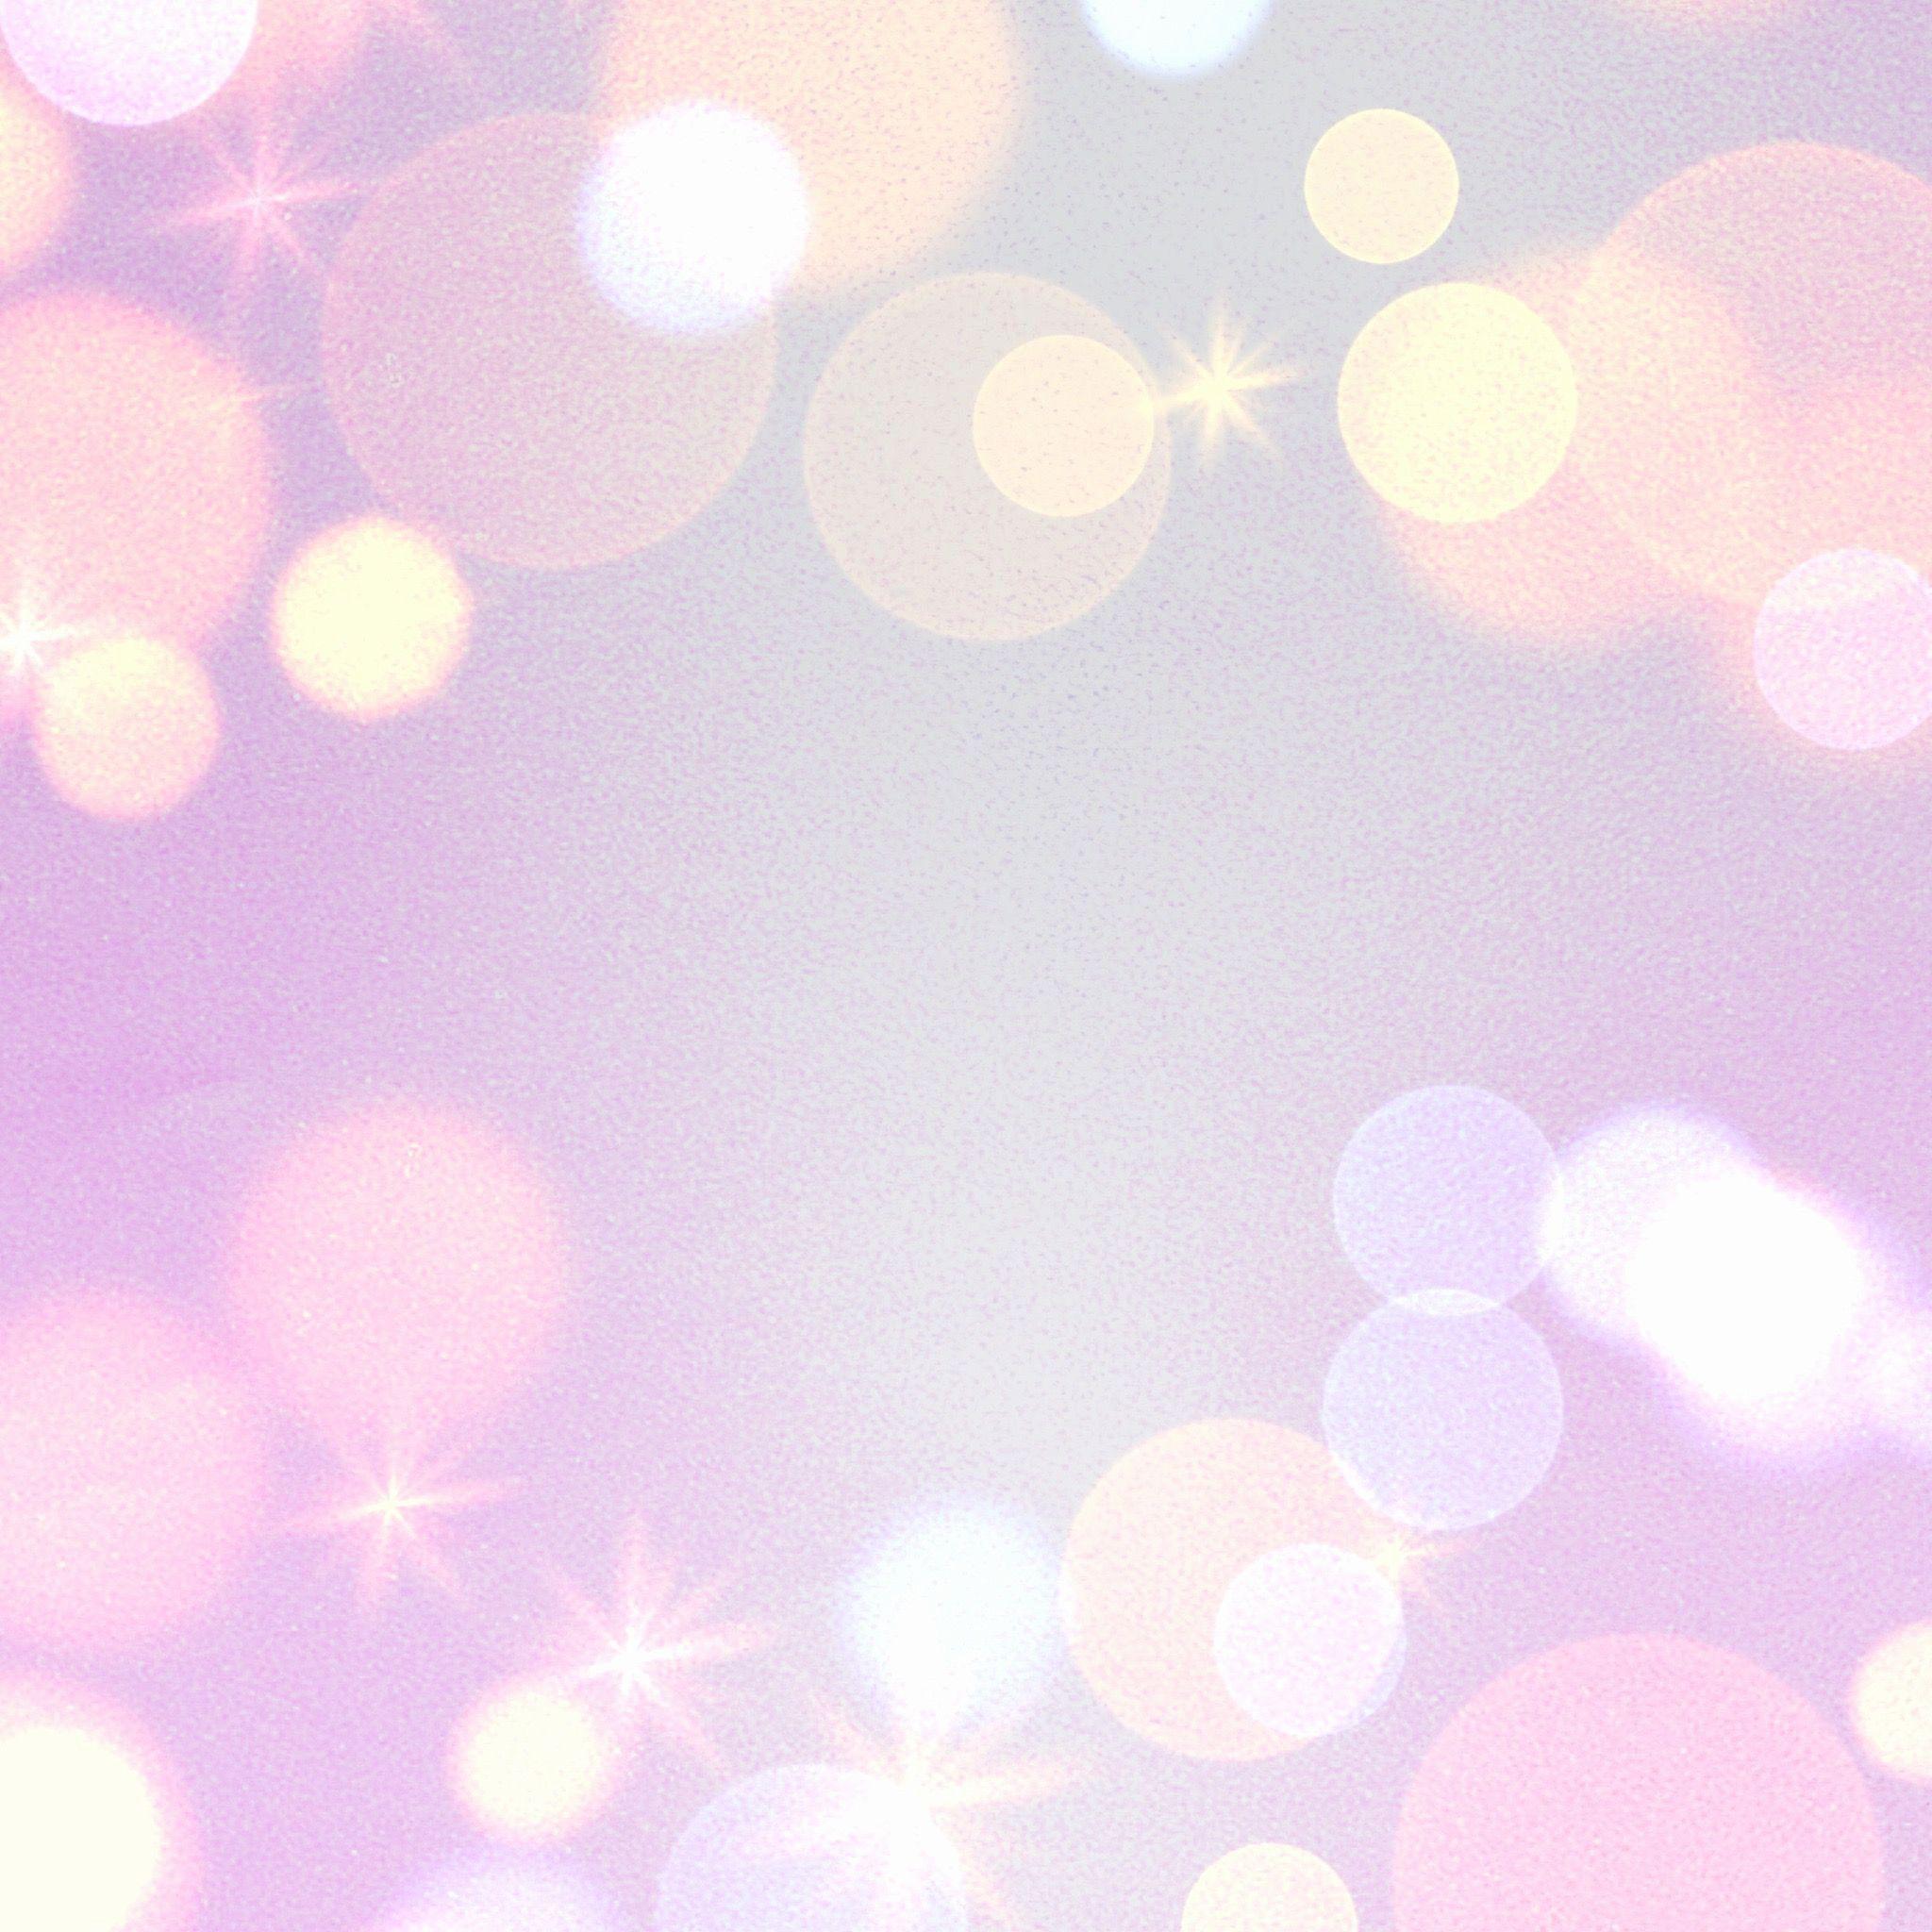 Pastel Glitter Wallpapers